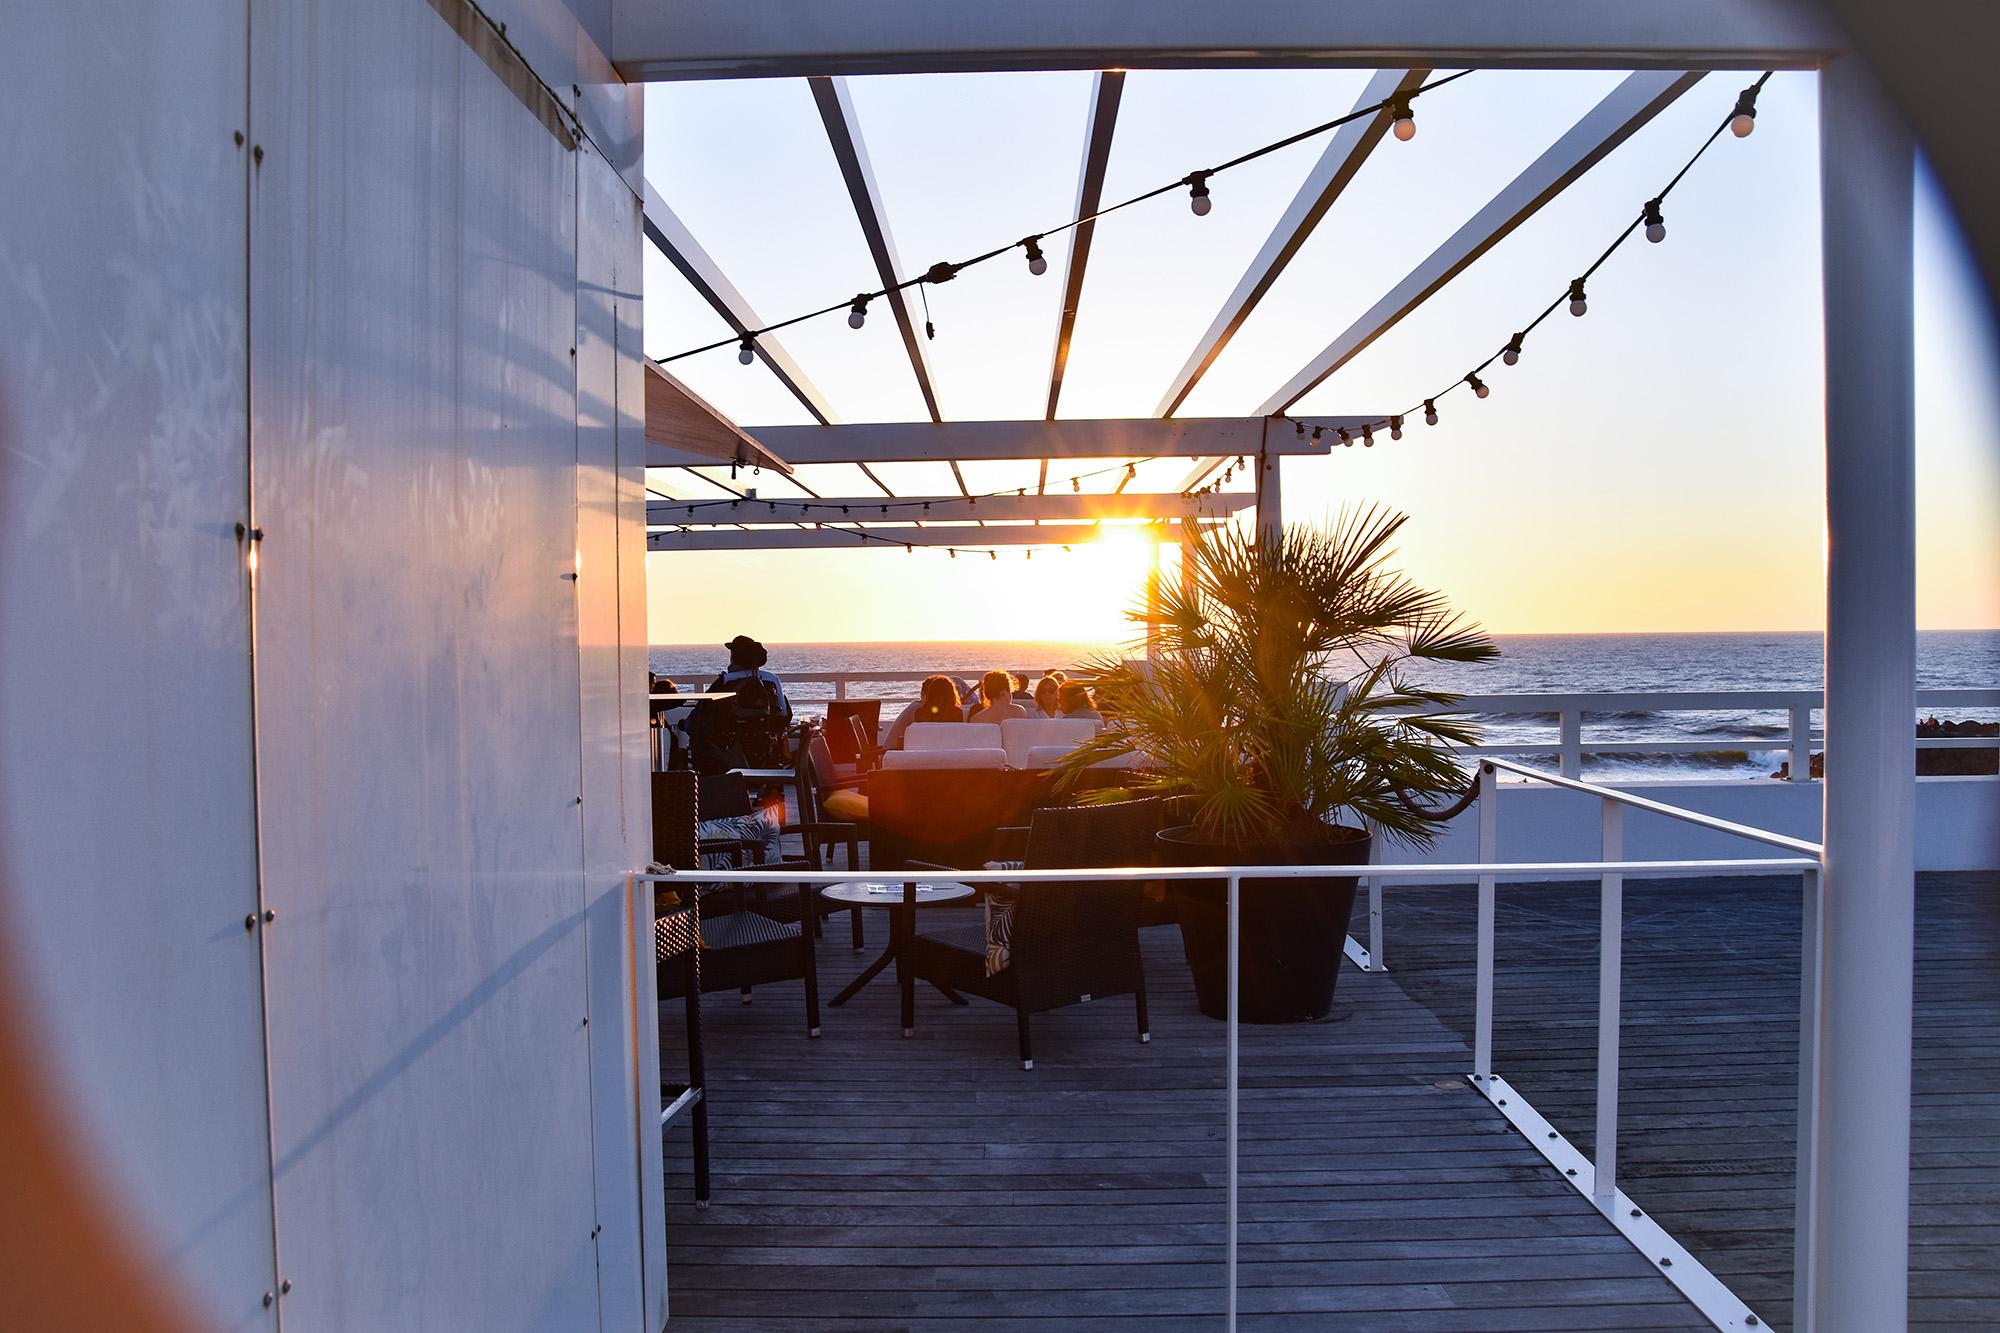 Le rooftop le lieu anglet - Restaurants anglet chambre d amour ...